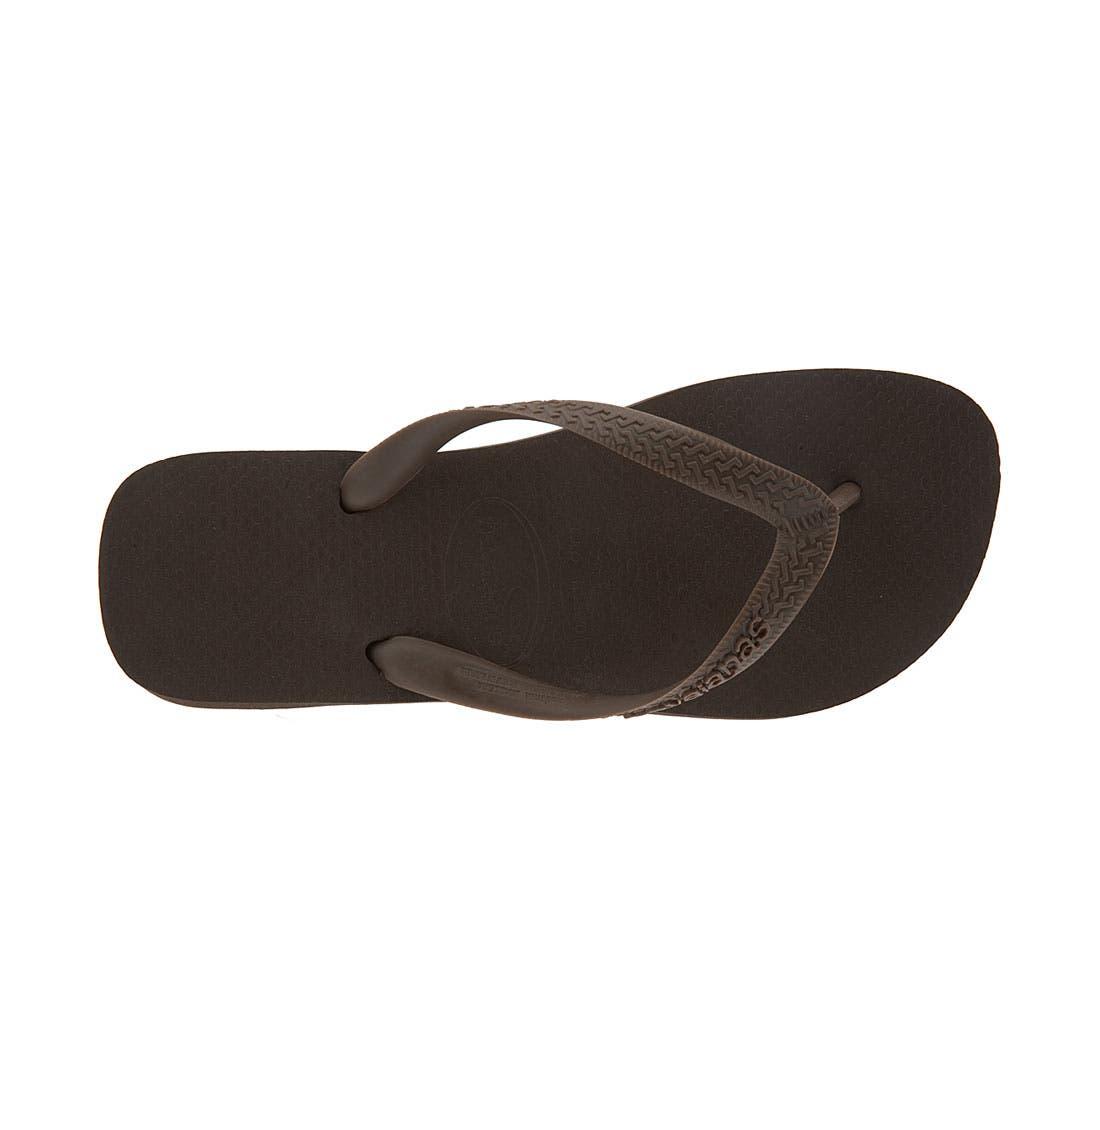 Alternate Image 3  - Havaianas 'Top' Sandal (Women)